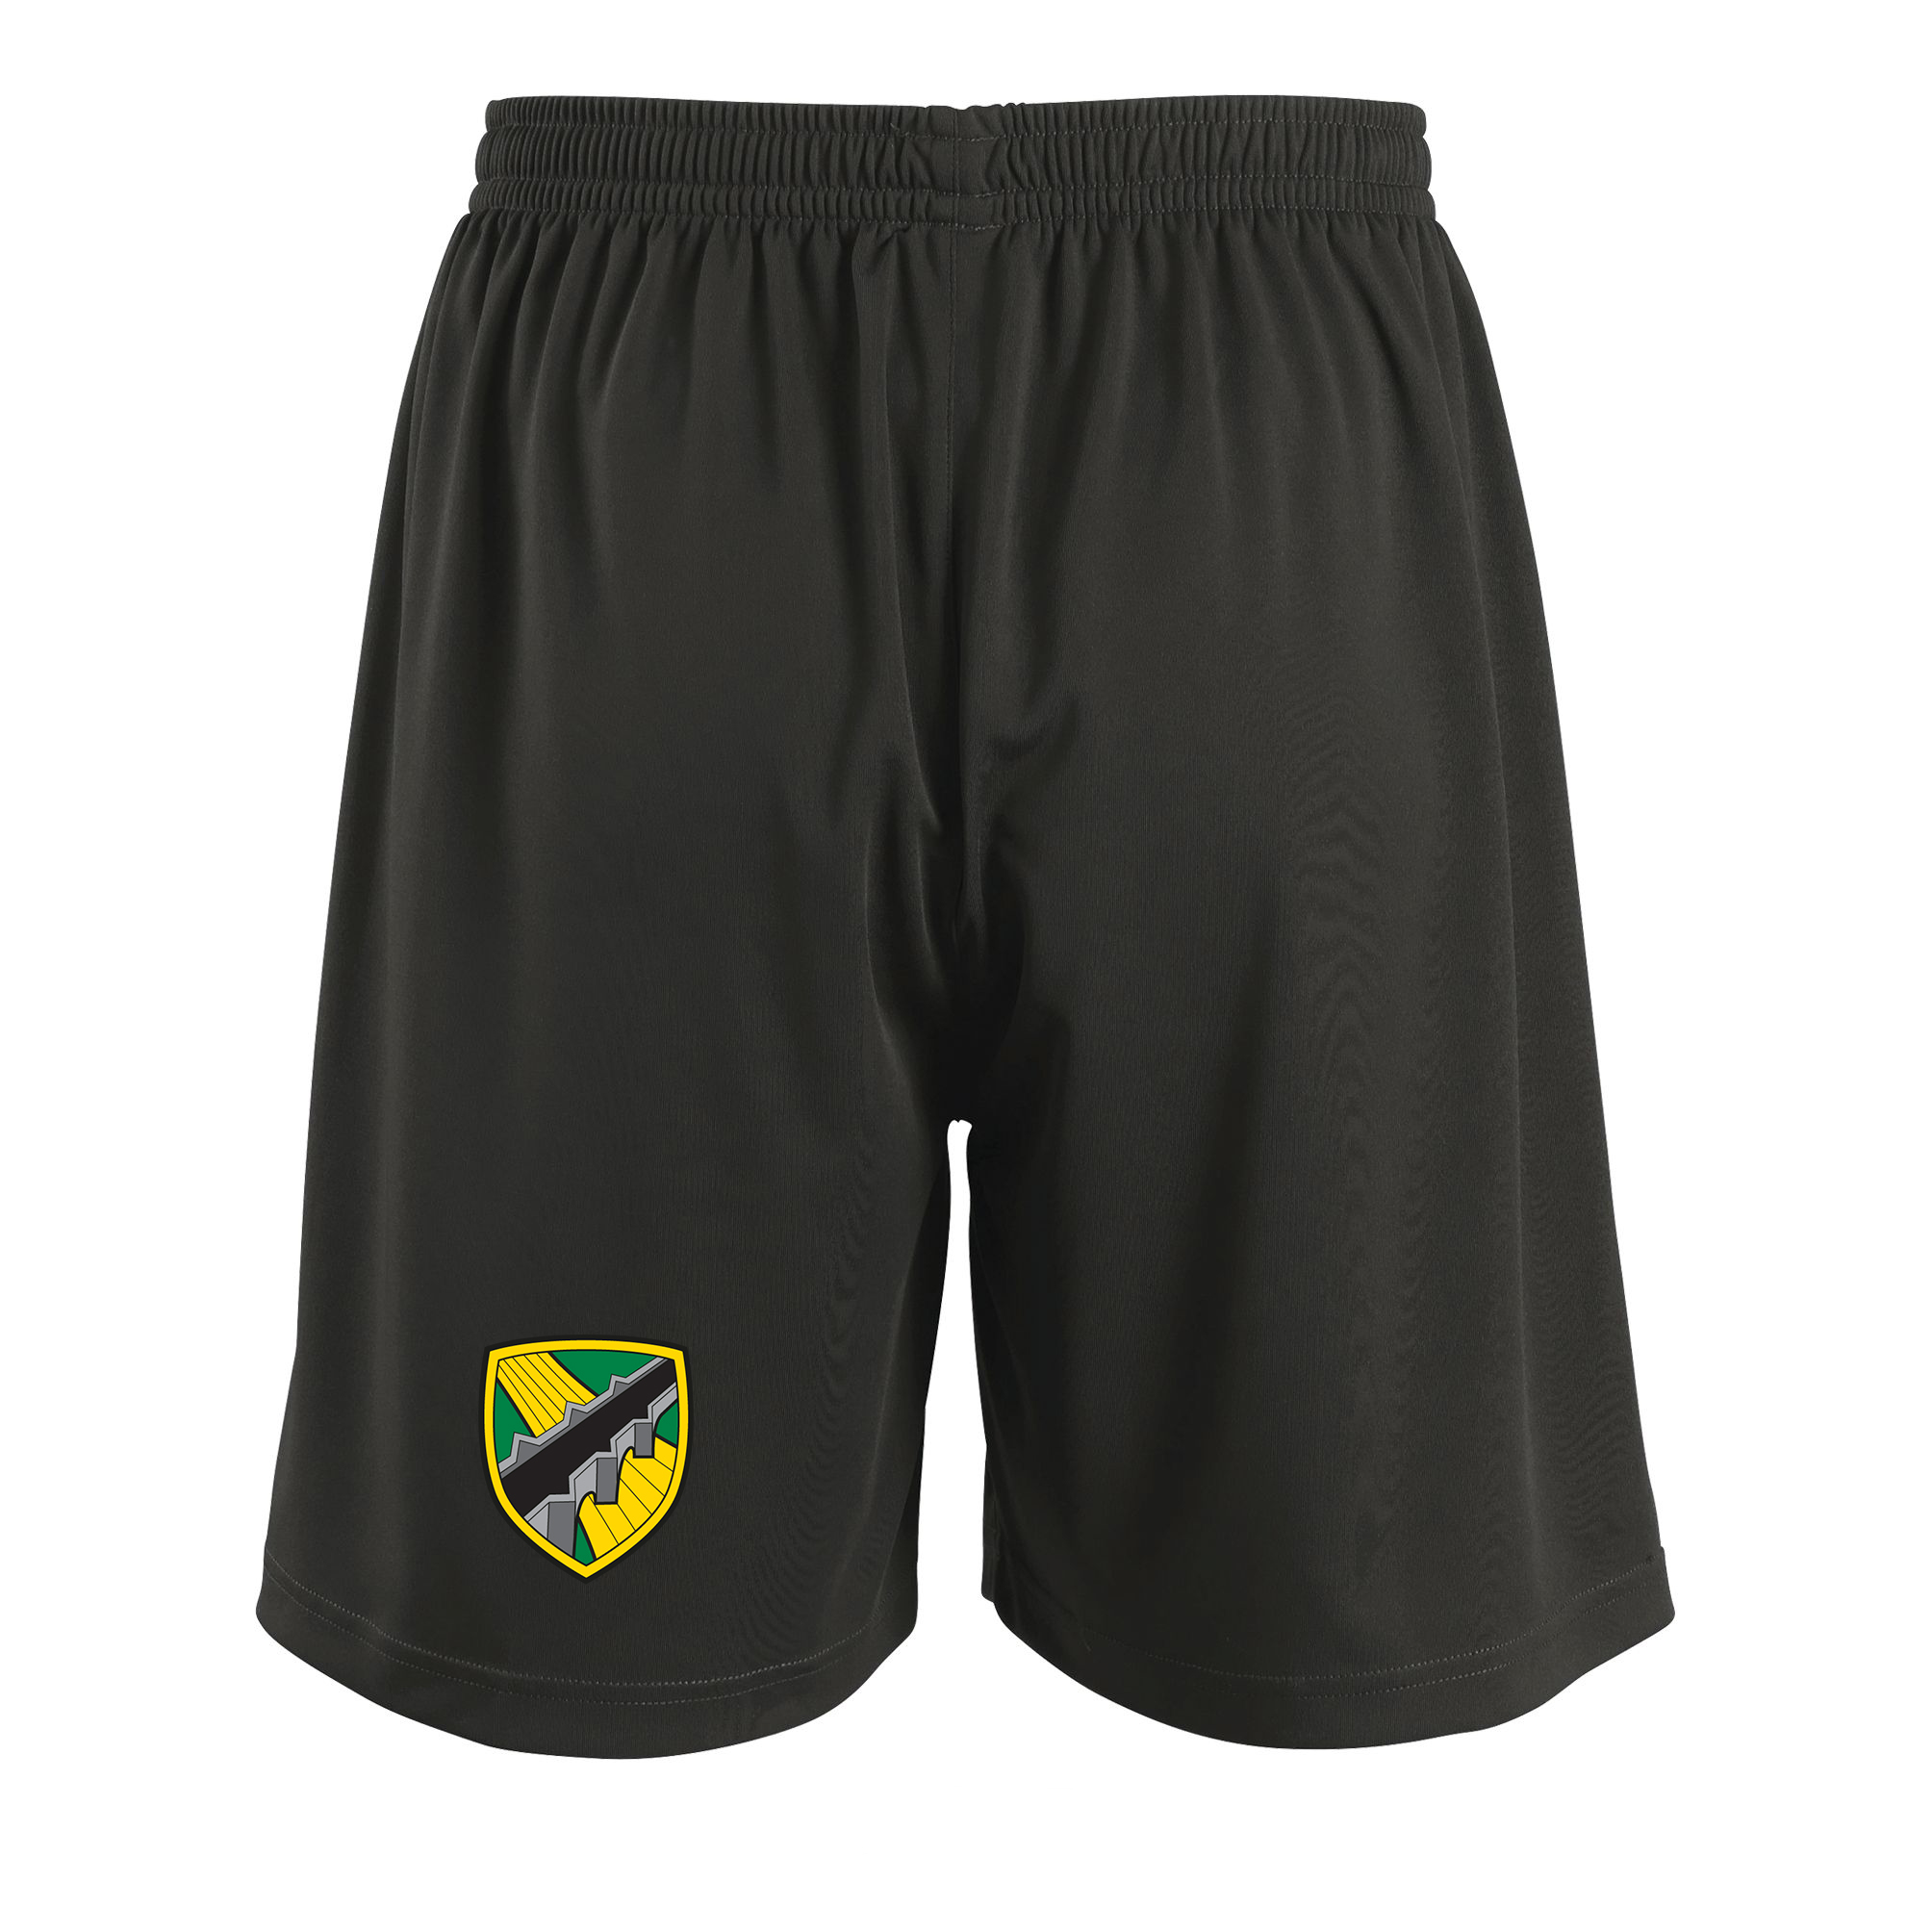 Water Orton Primary School PE Shorts